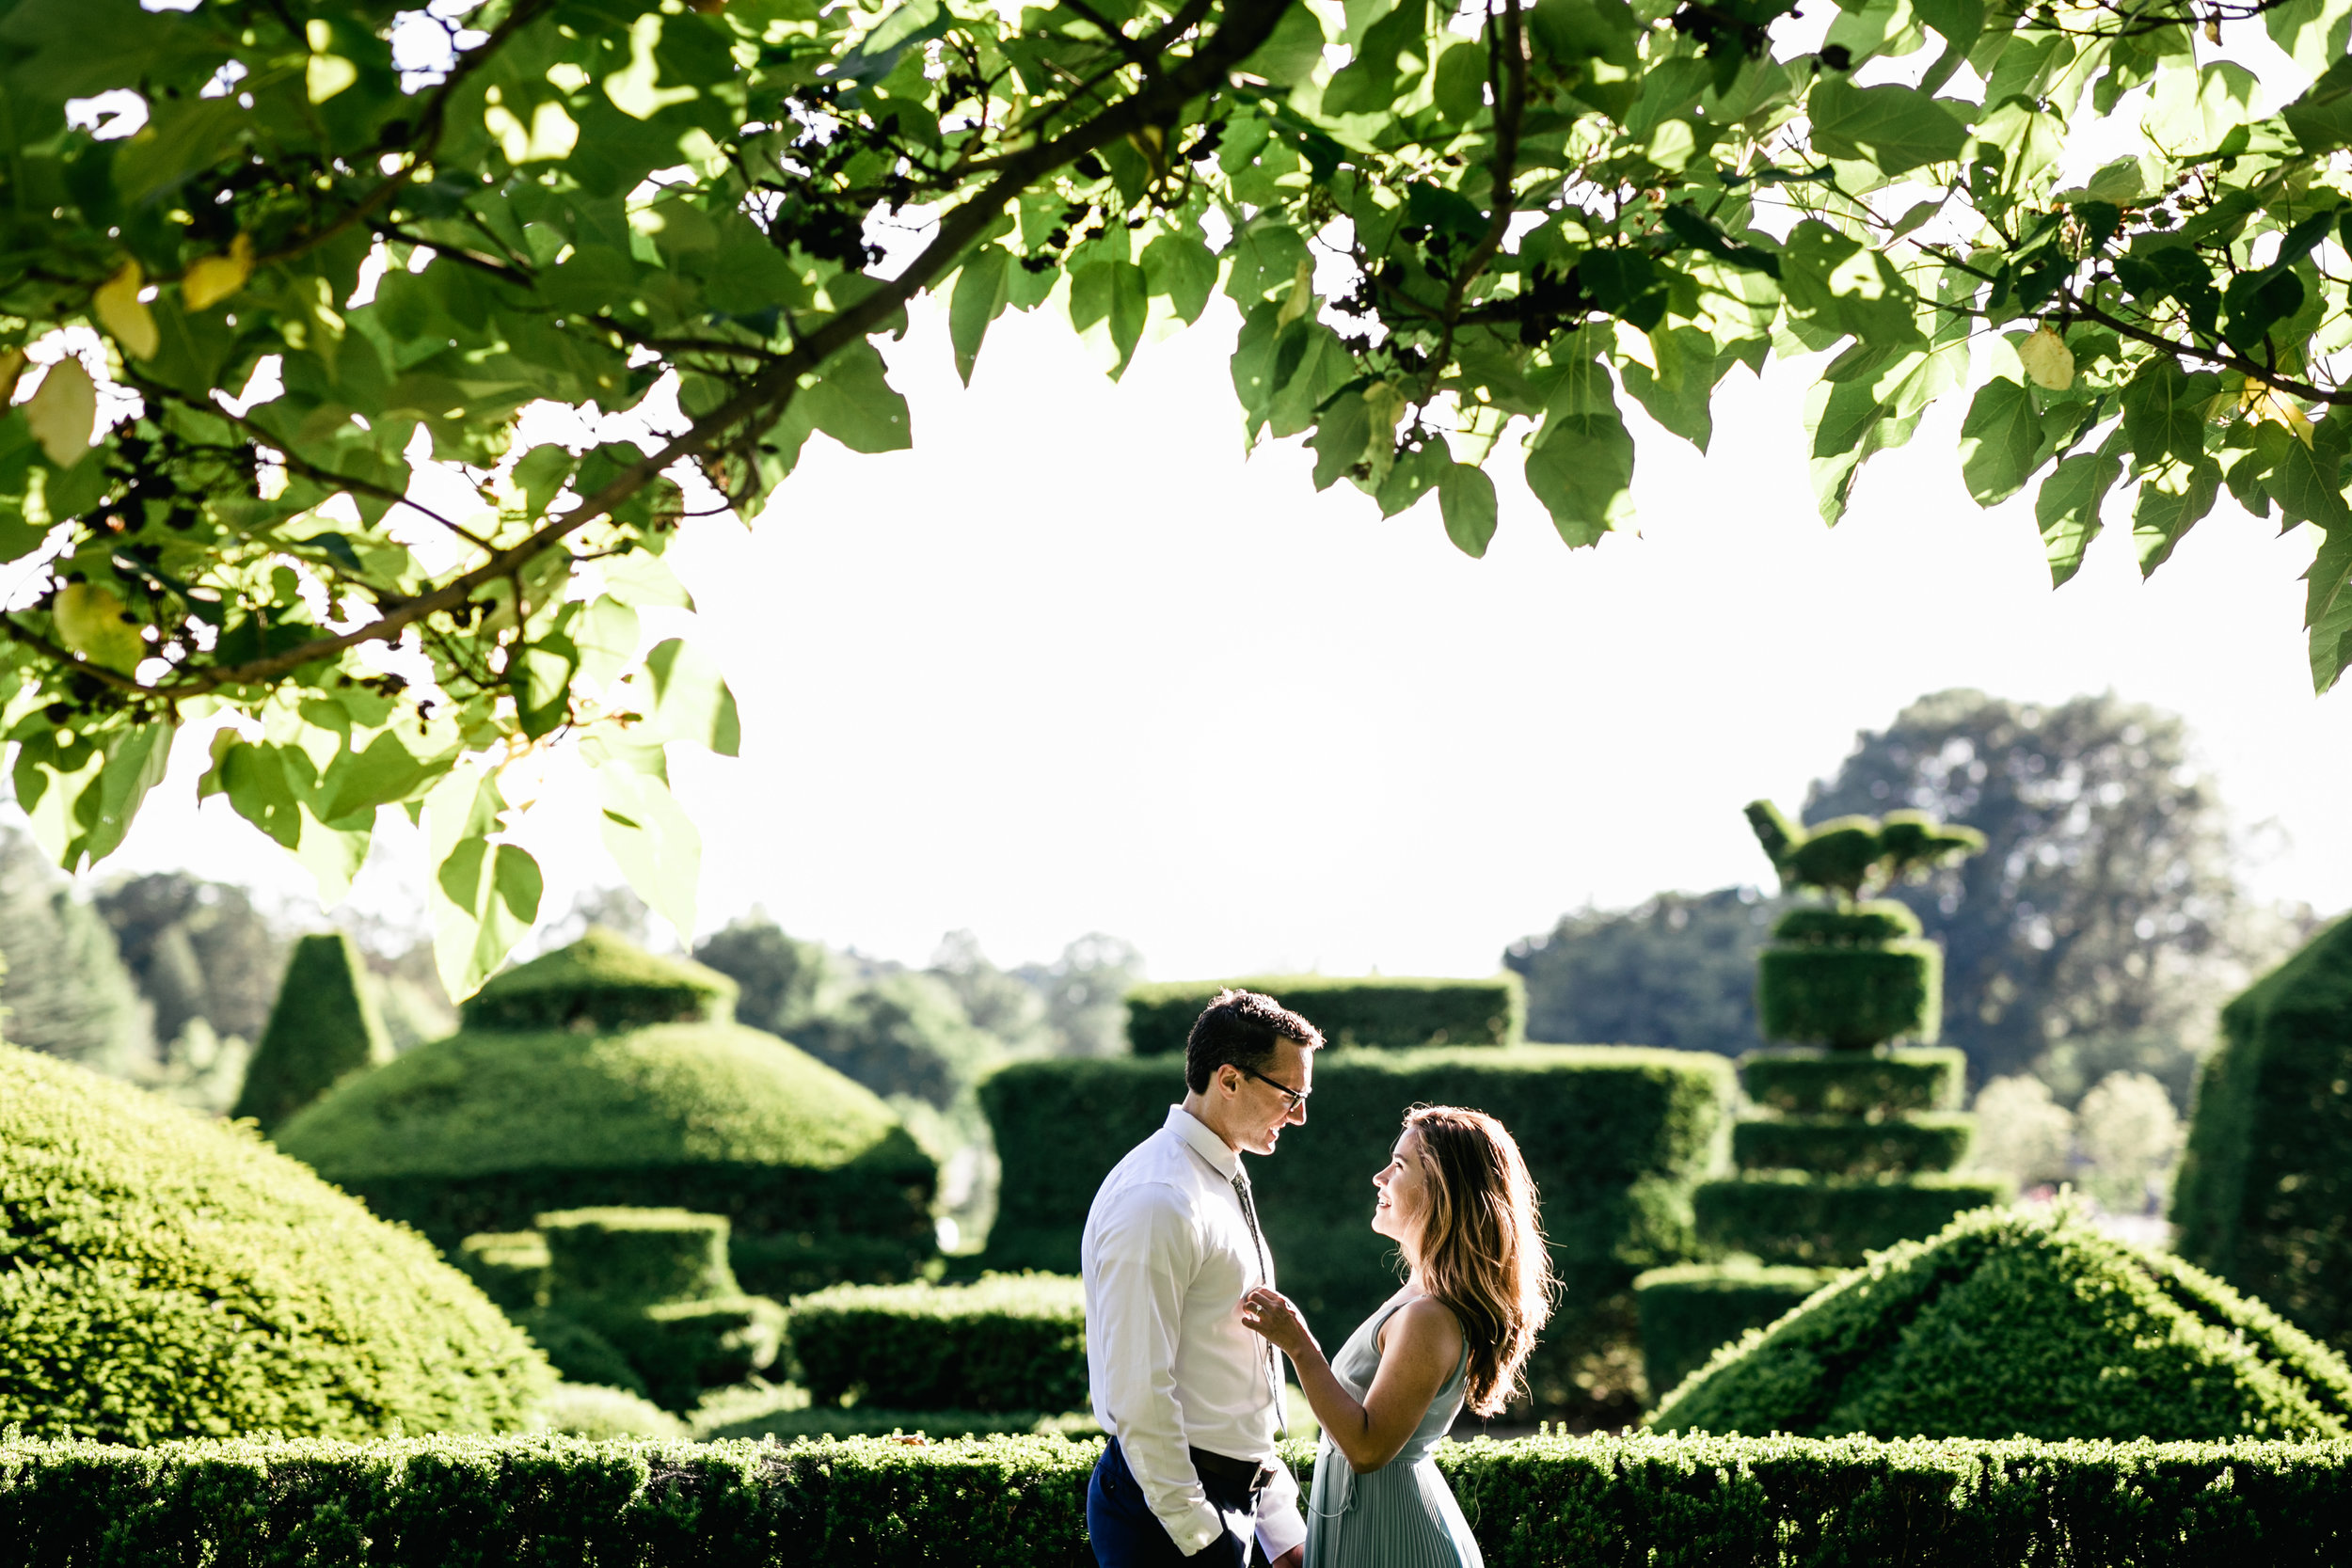 photography-natural-candid-engaged-proposal-philadelphia-wedding-longwood gardends-nature-flowers-modern-lifestyle-02.JPG